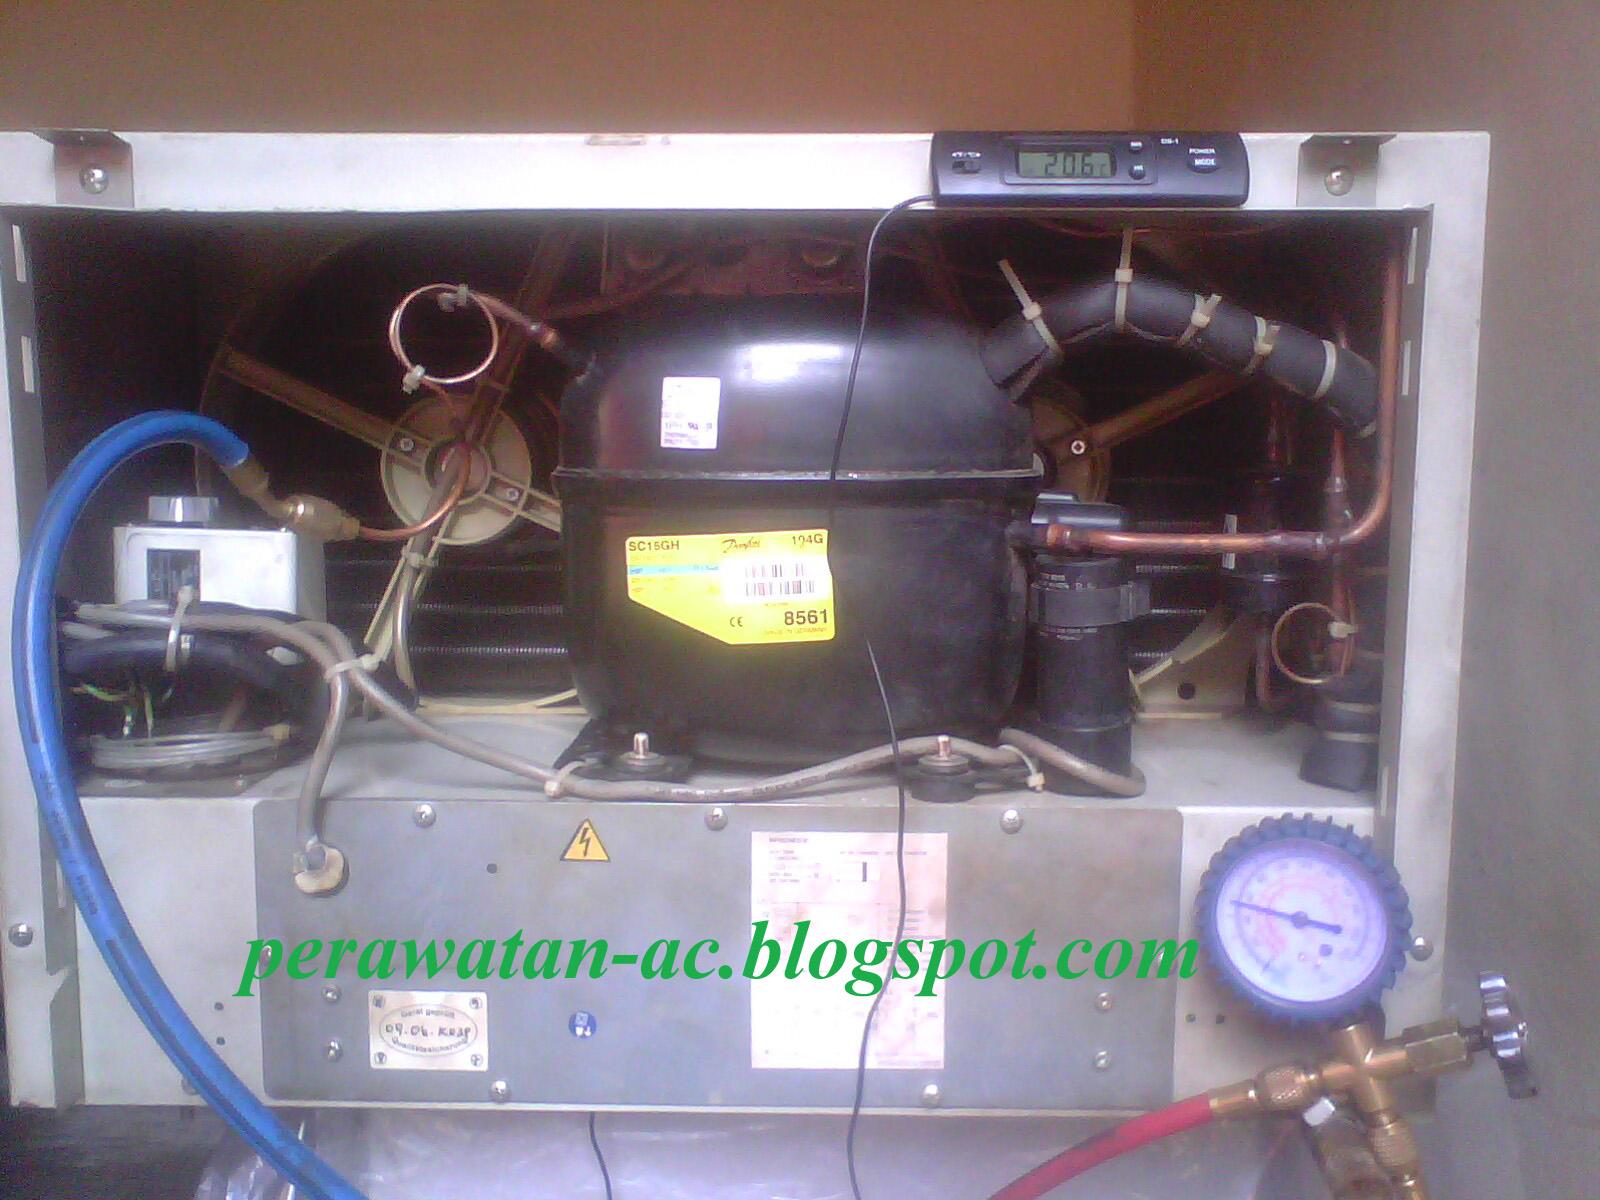 Rittal Air Conditioner Sk3305540 Manual